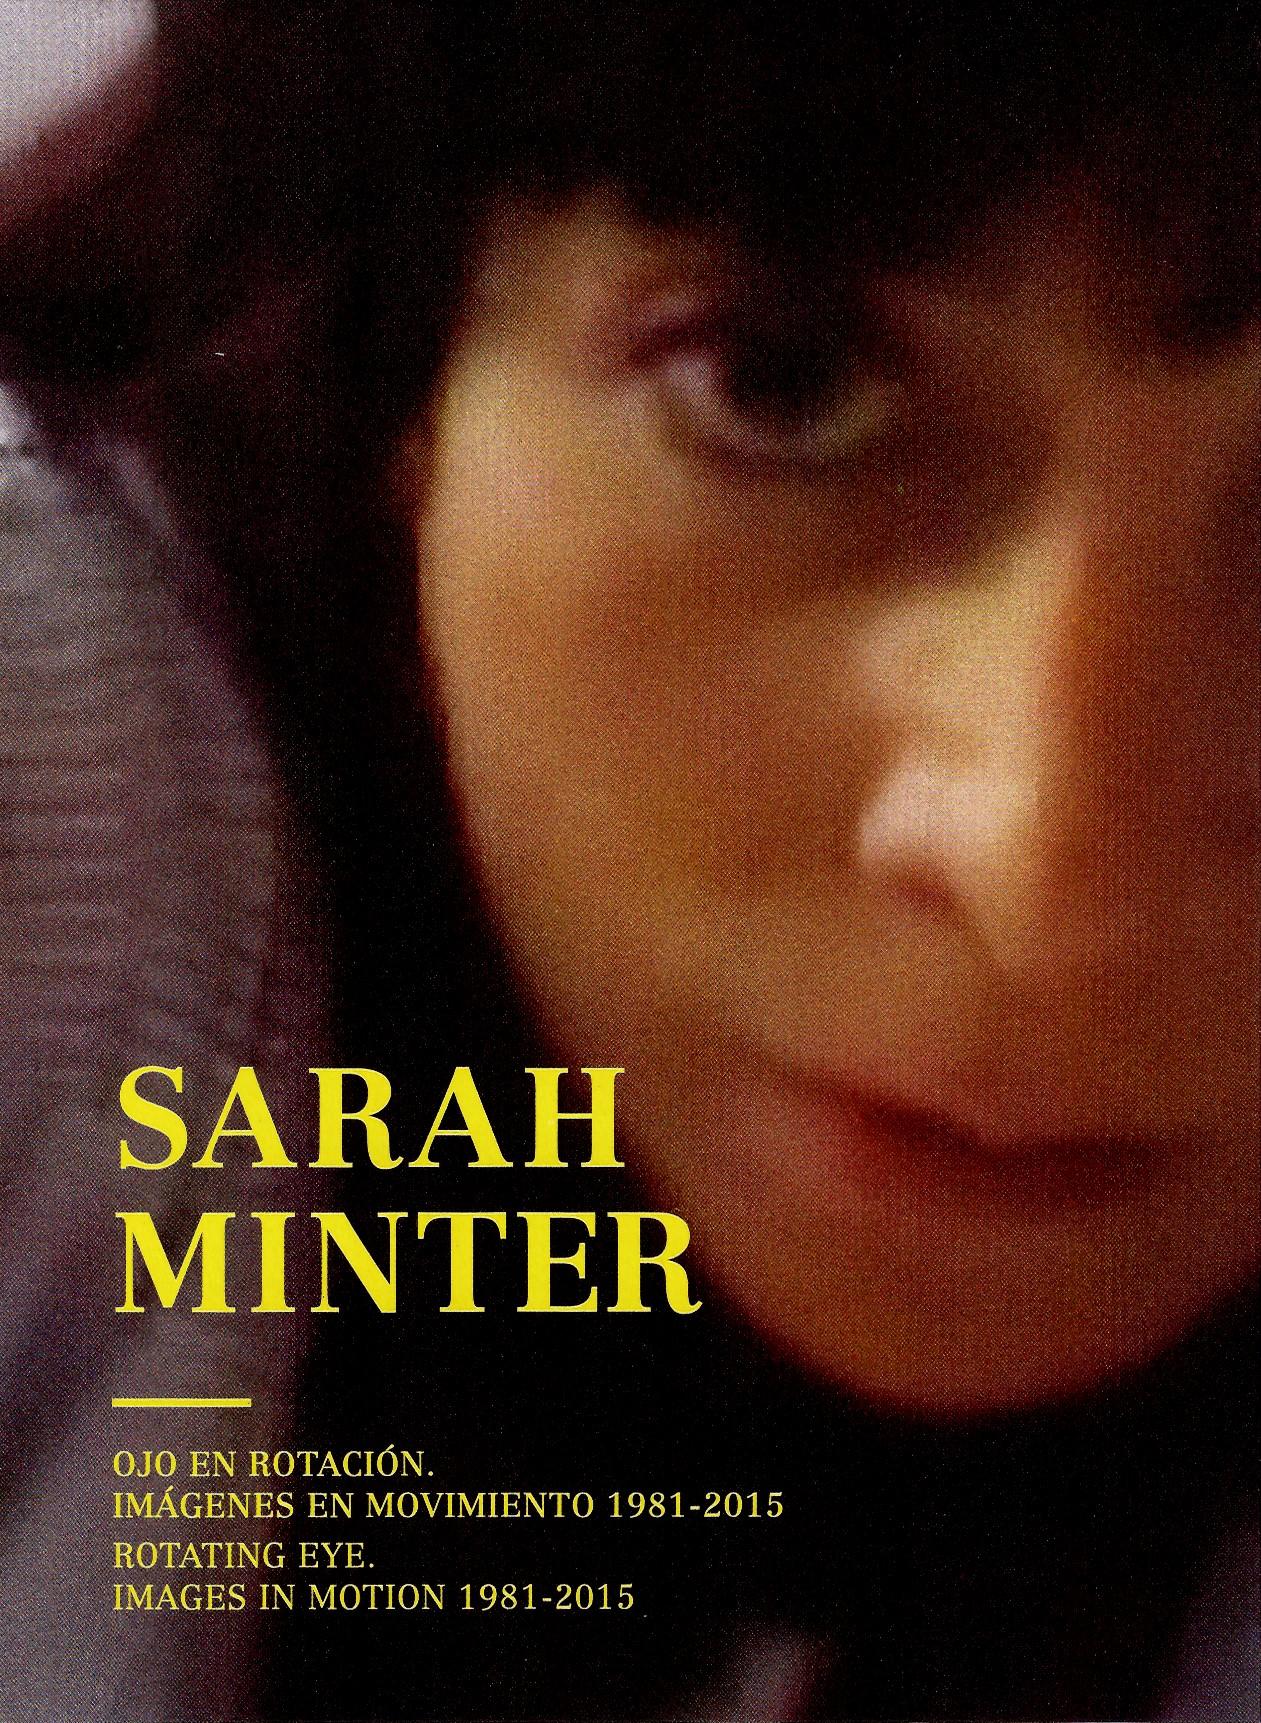 Sara Minter.